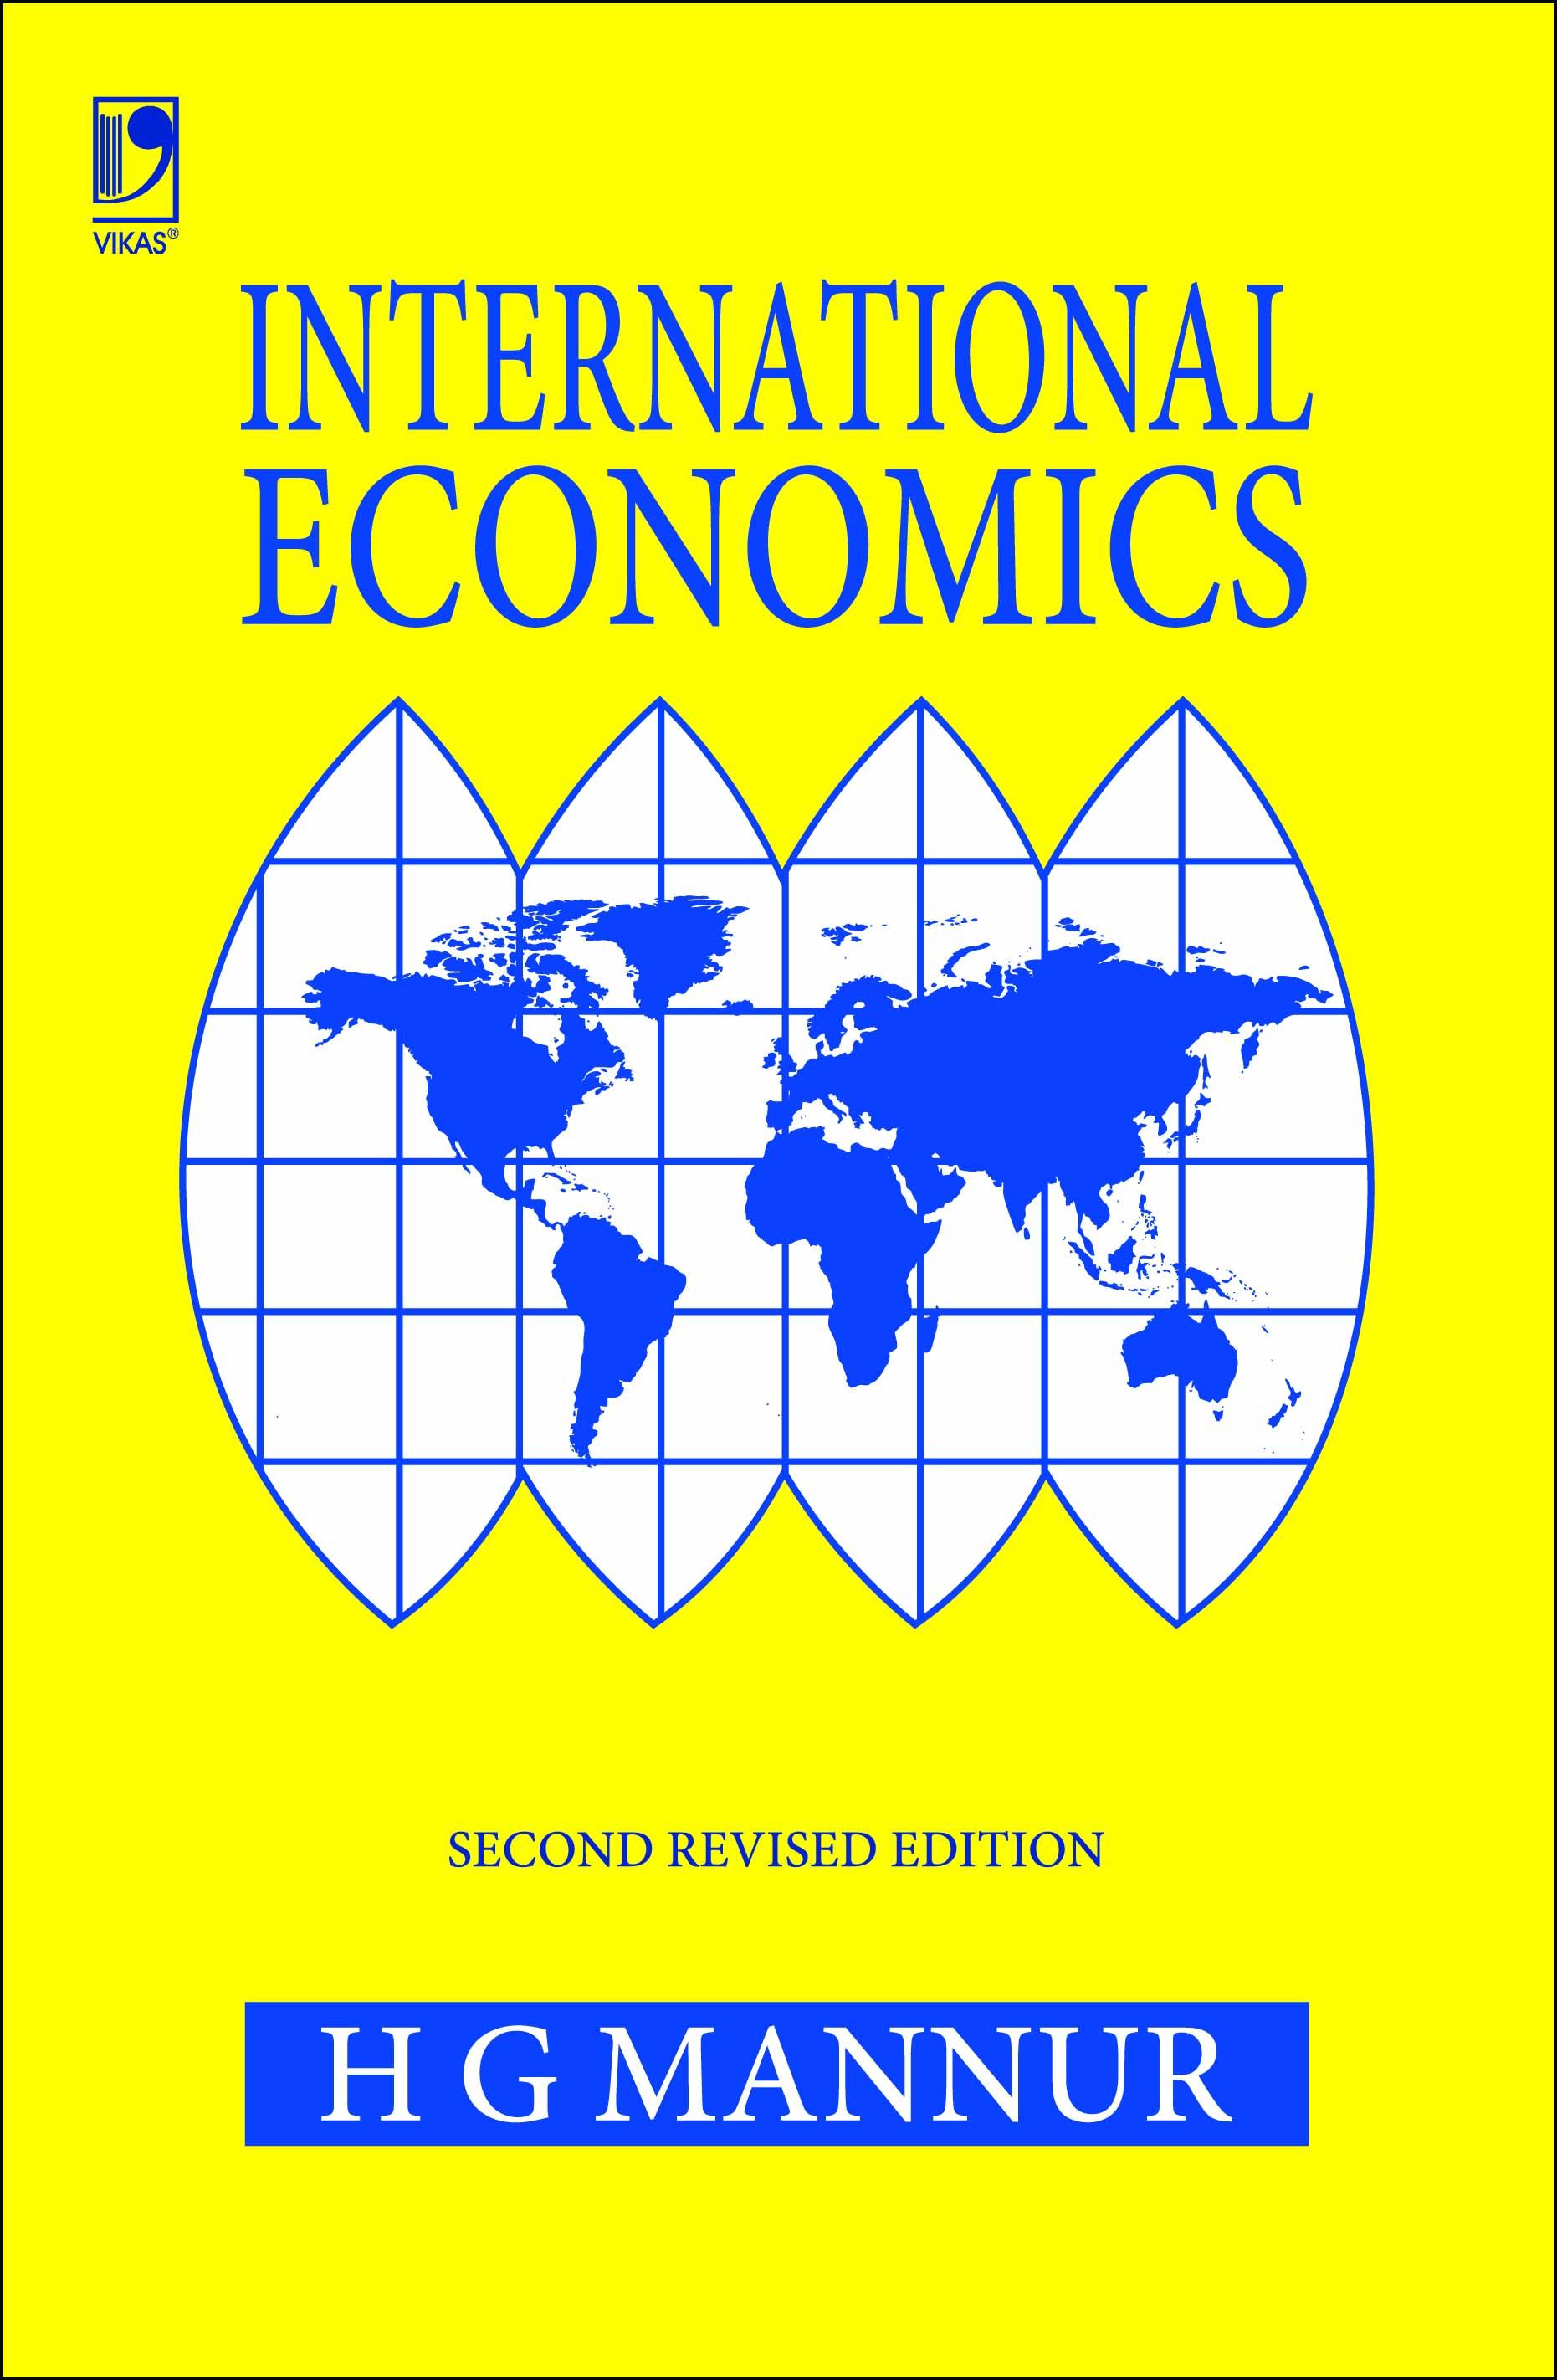 International Economics, 2/e  by  H G Mannur